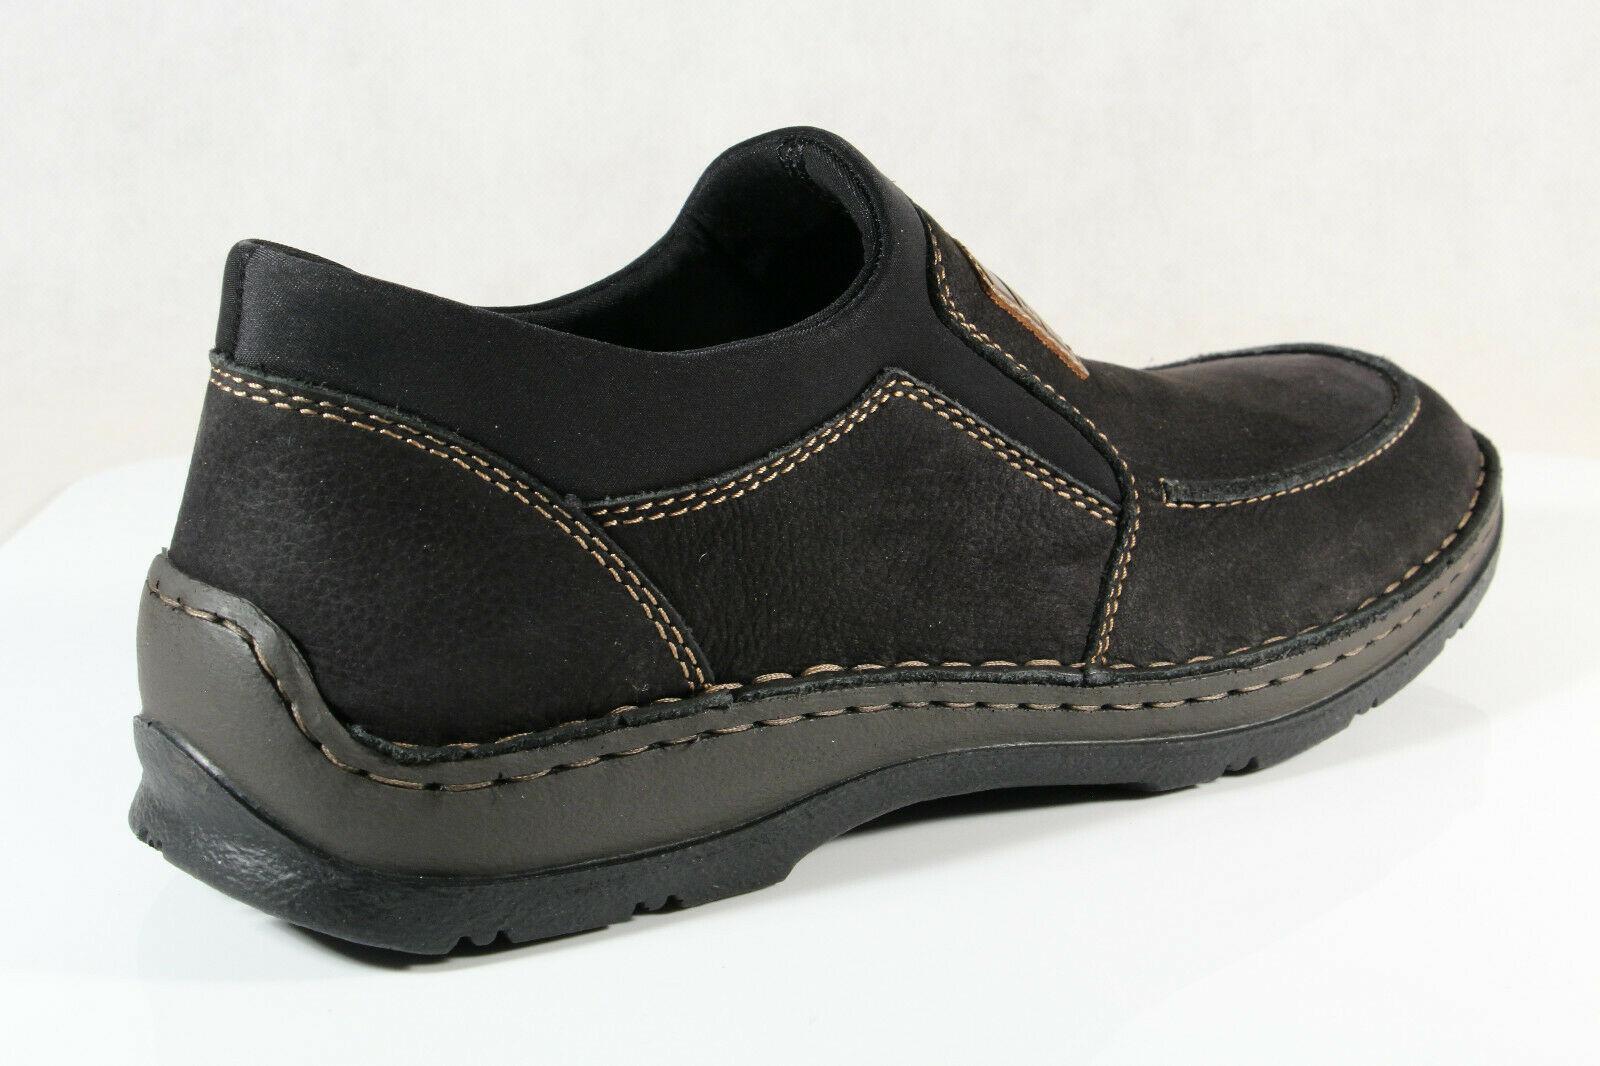 Rieker Slipper Halbschuhe Sneaker schwarz Extra Weit 05352 Nwrkl